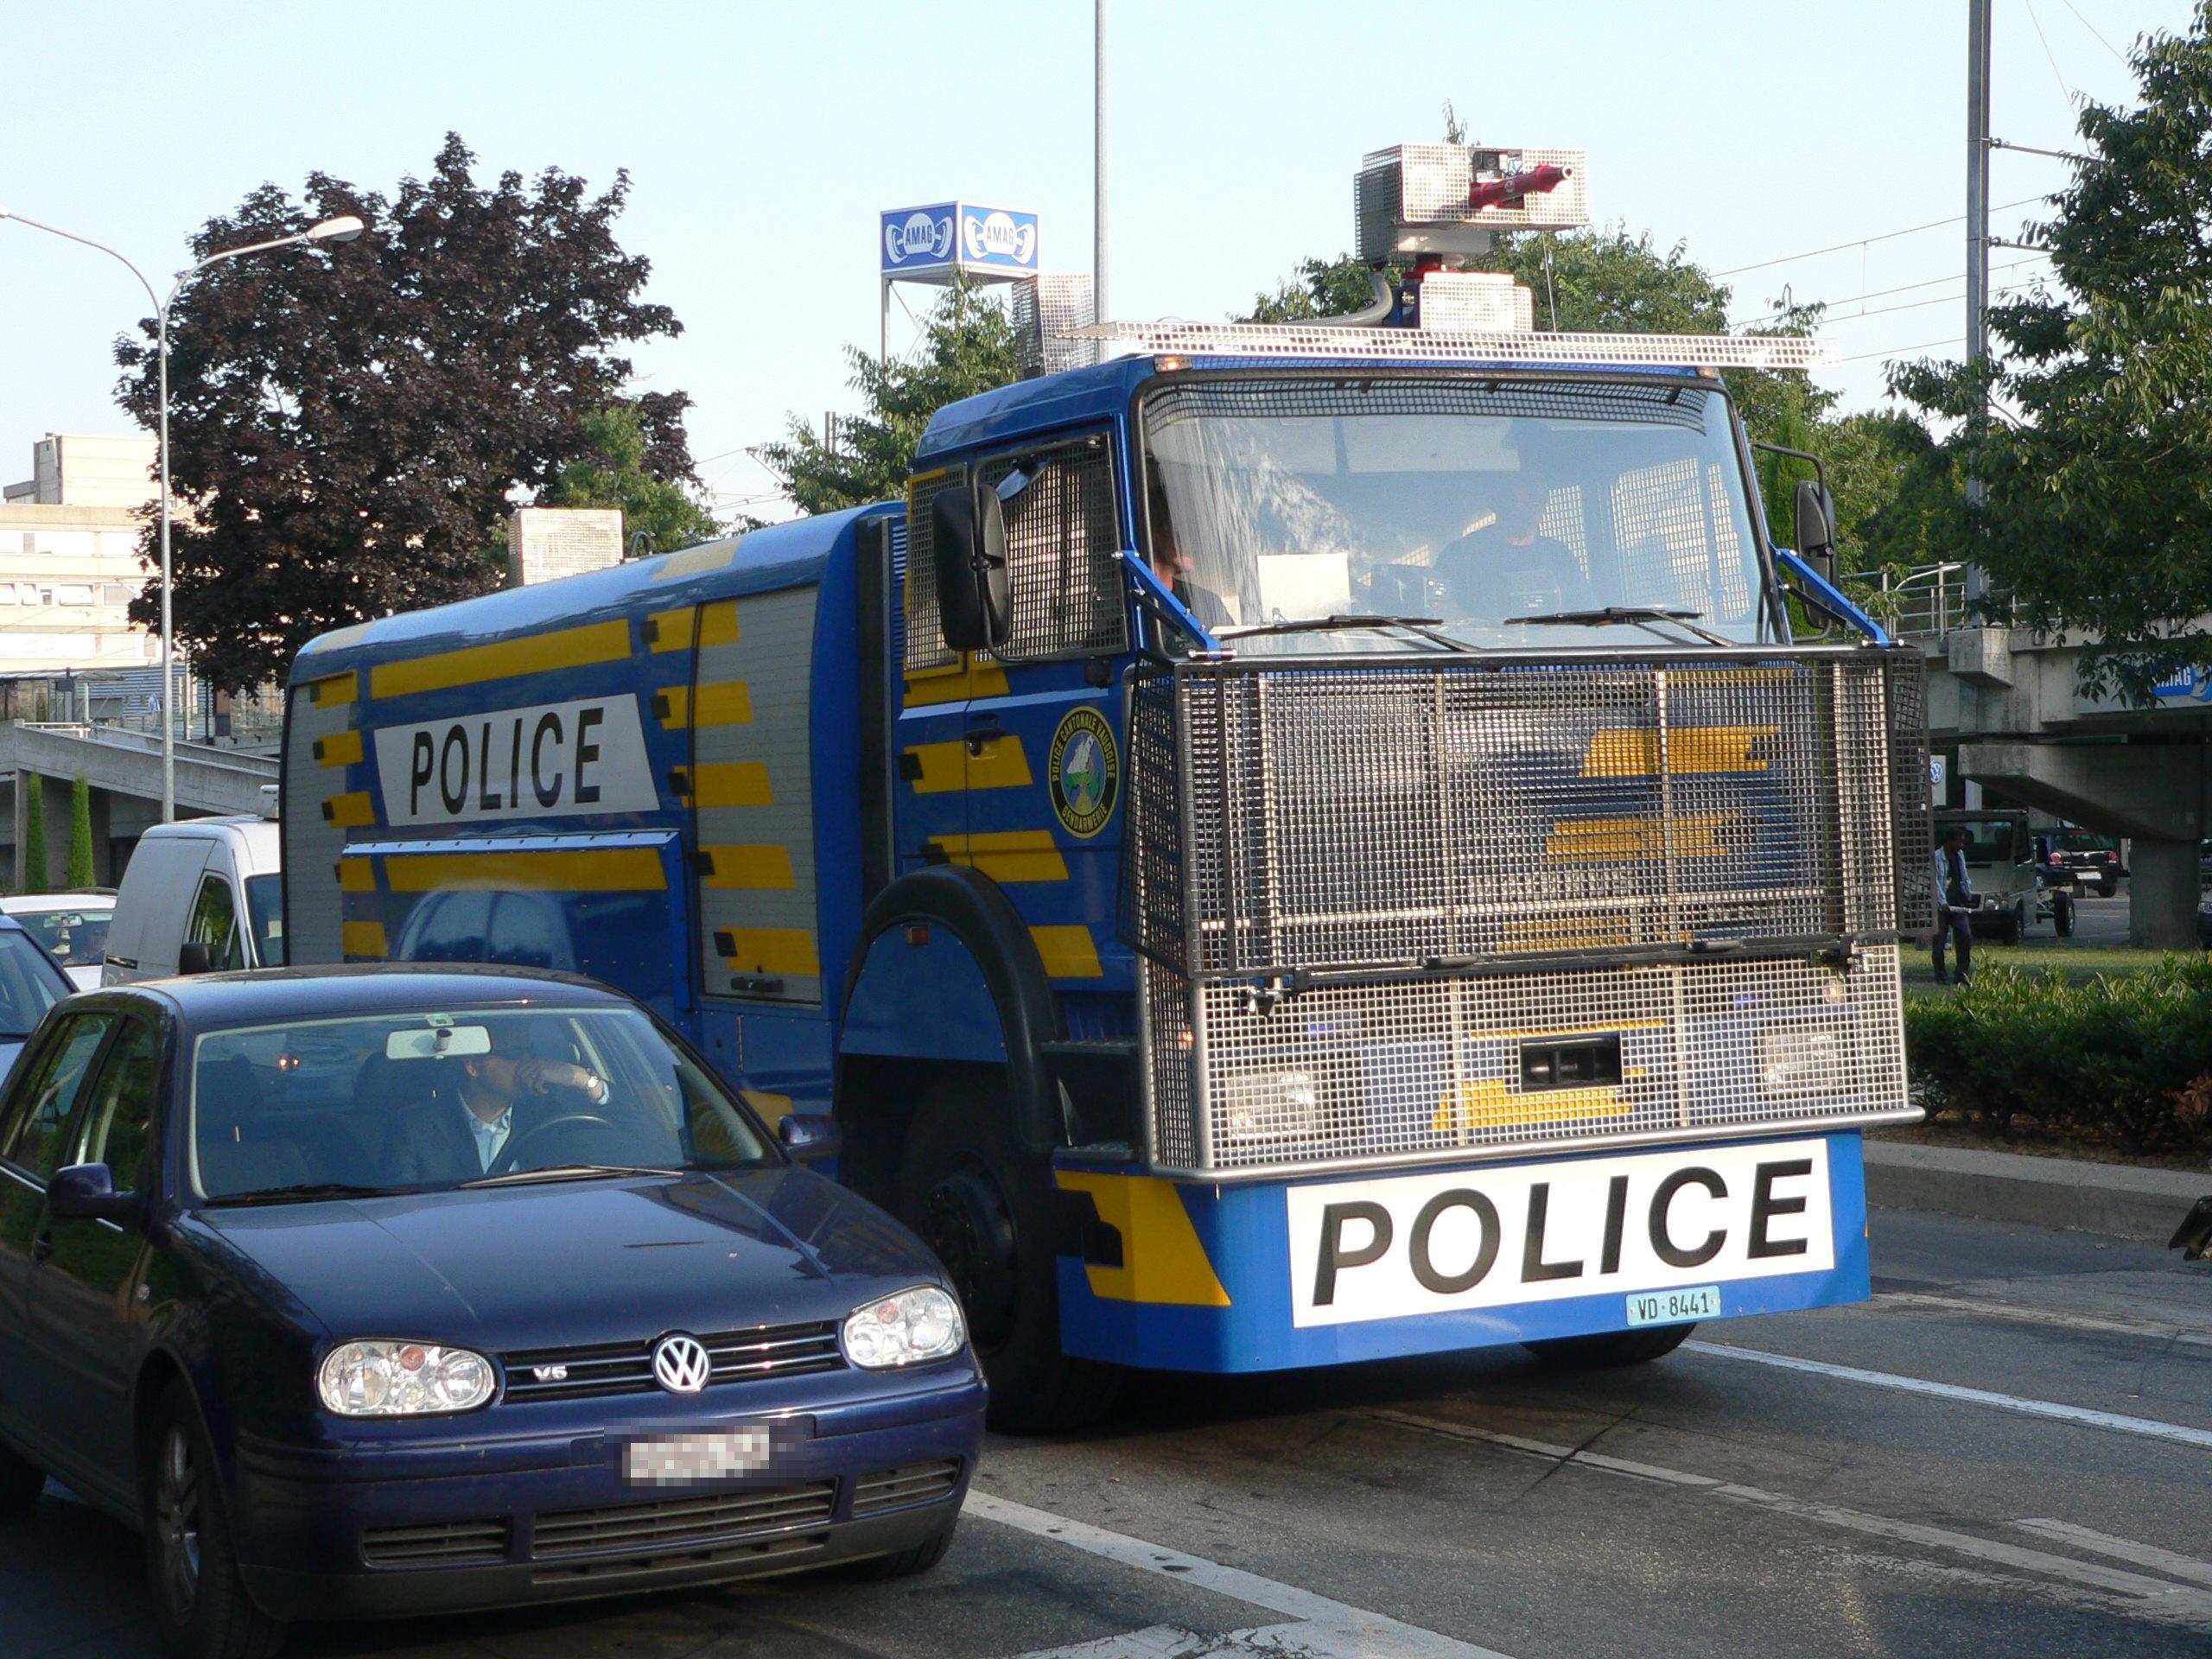 File:Police-antiemeute-p1000485.jpg - Wikimedia Commons